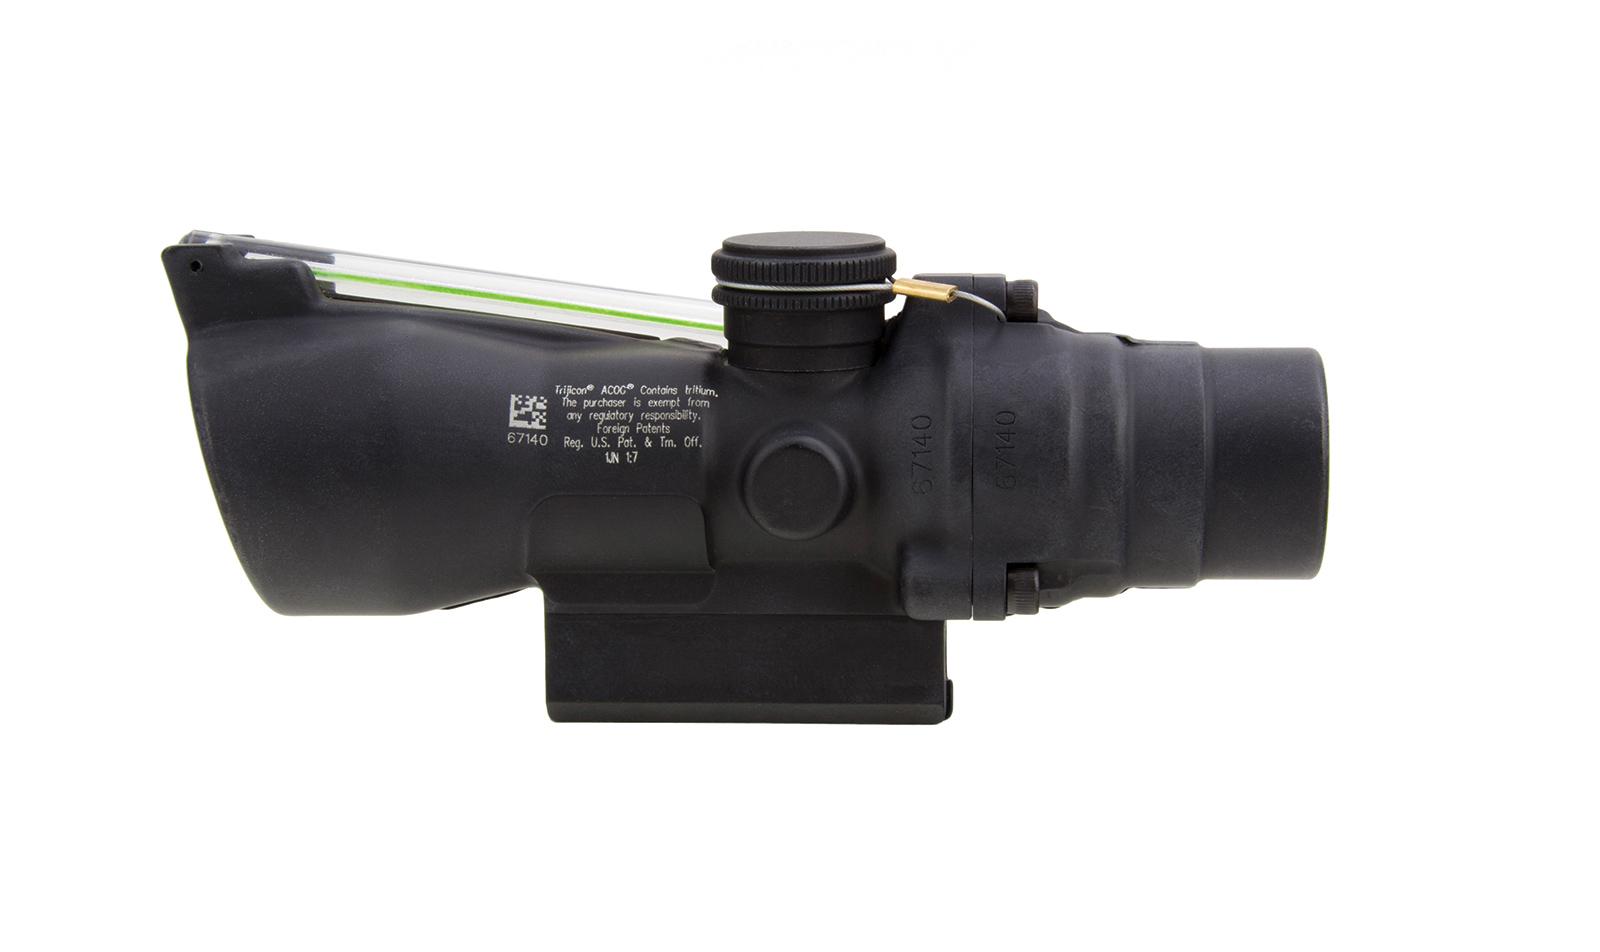 TA50-C-400145 angle 2